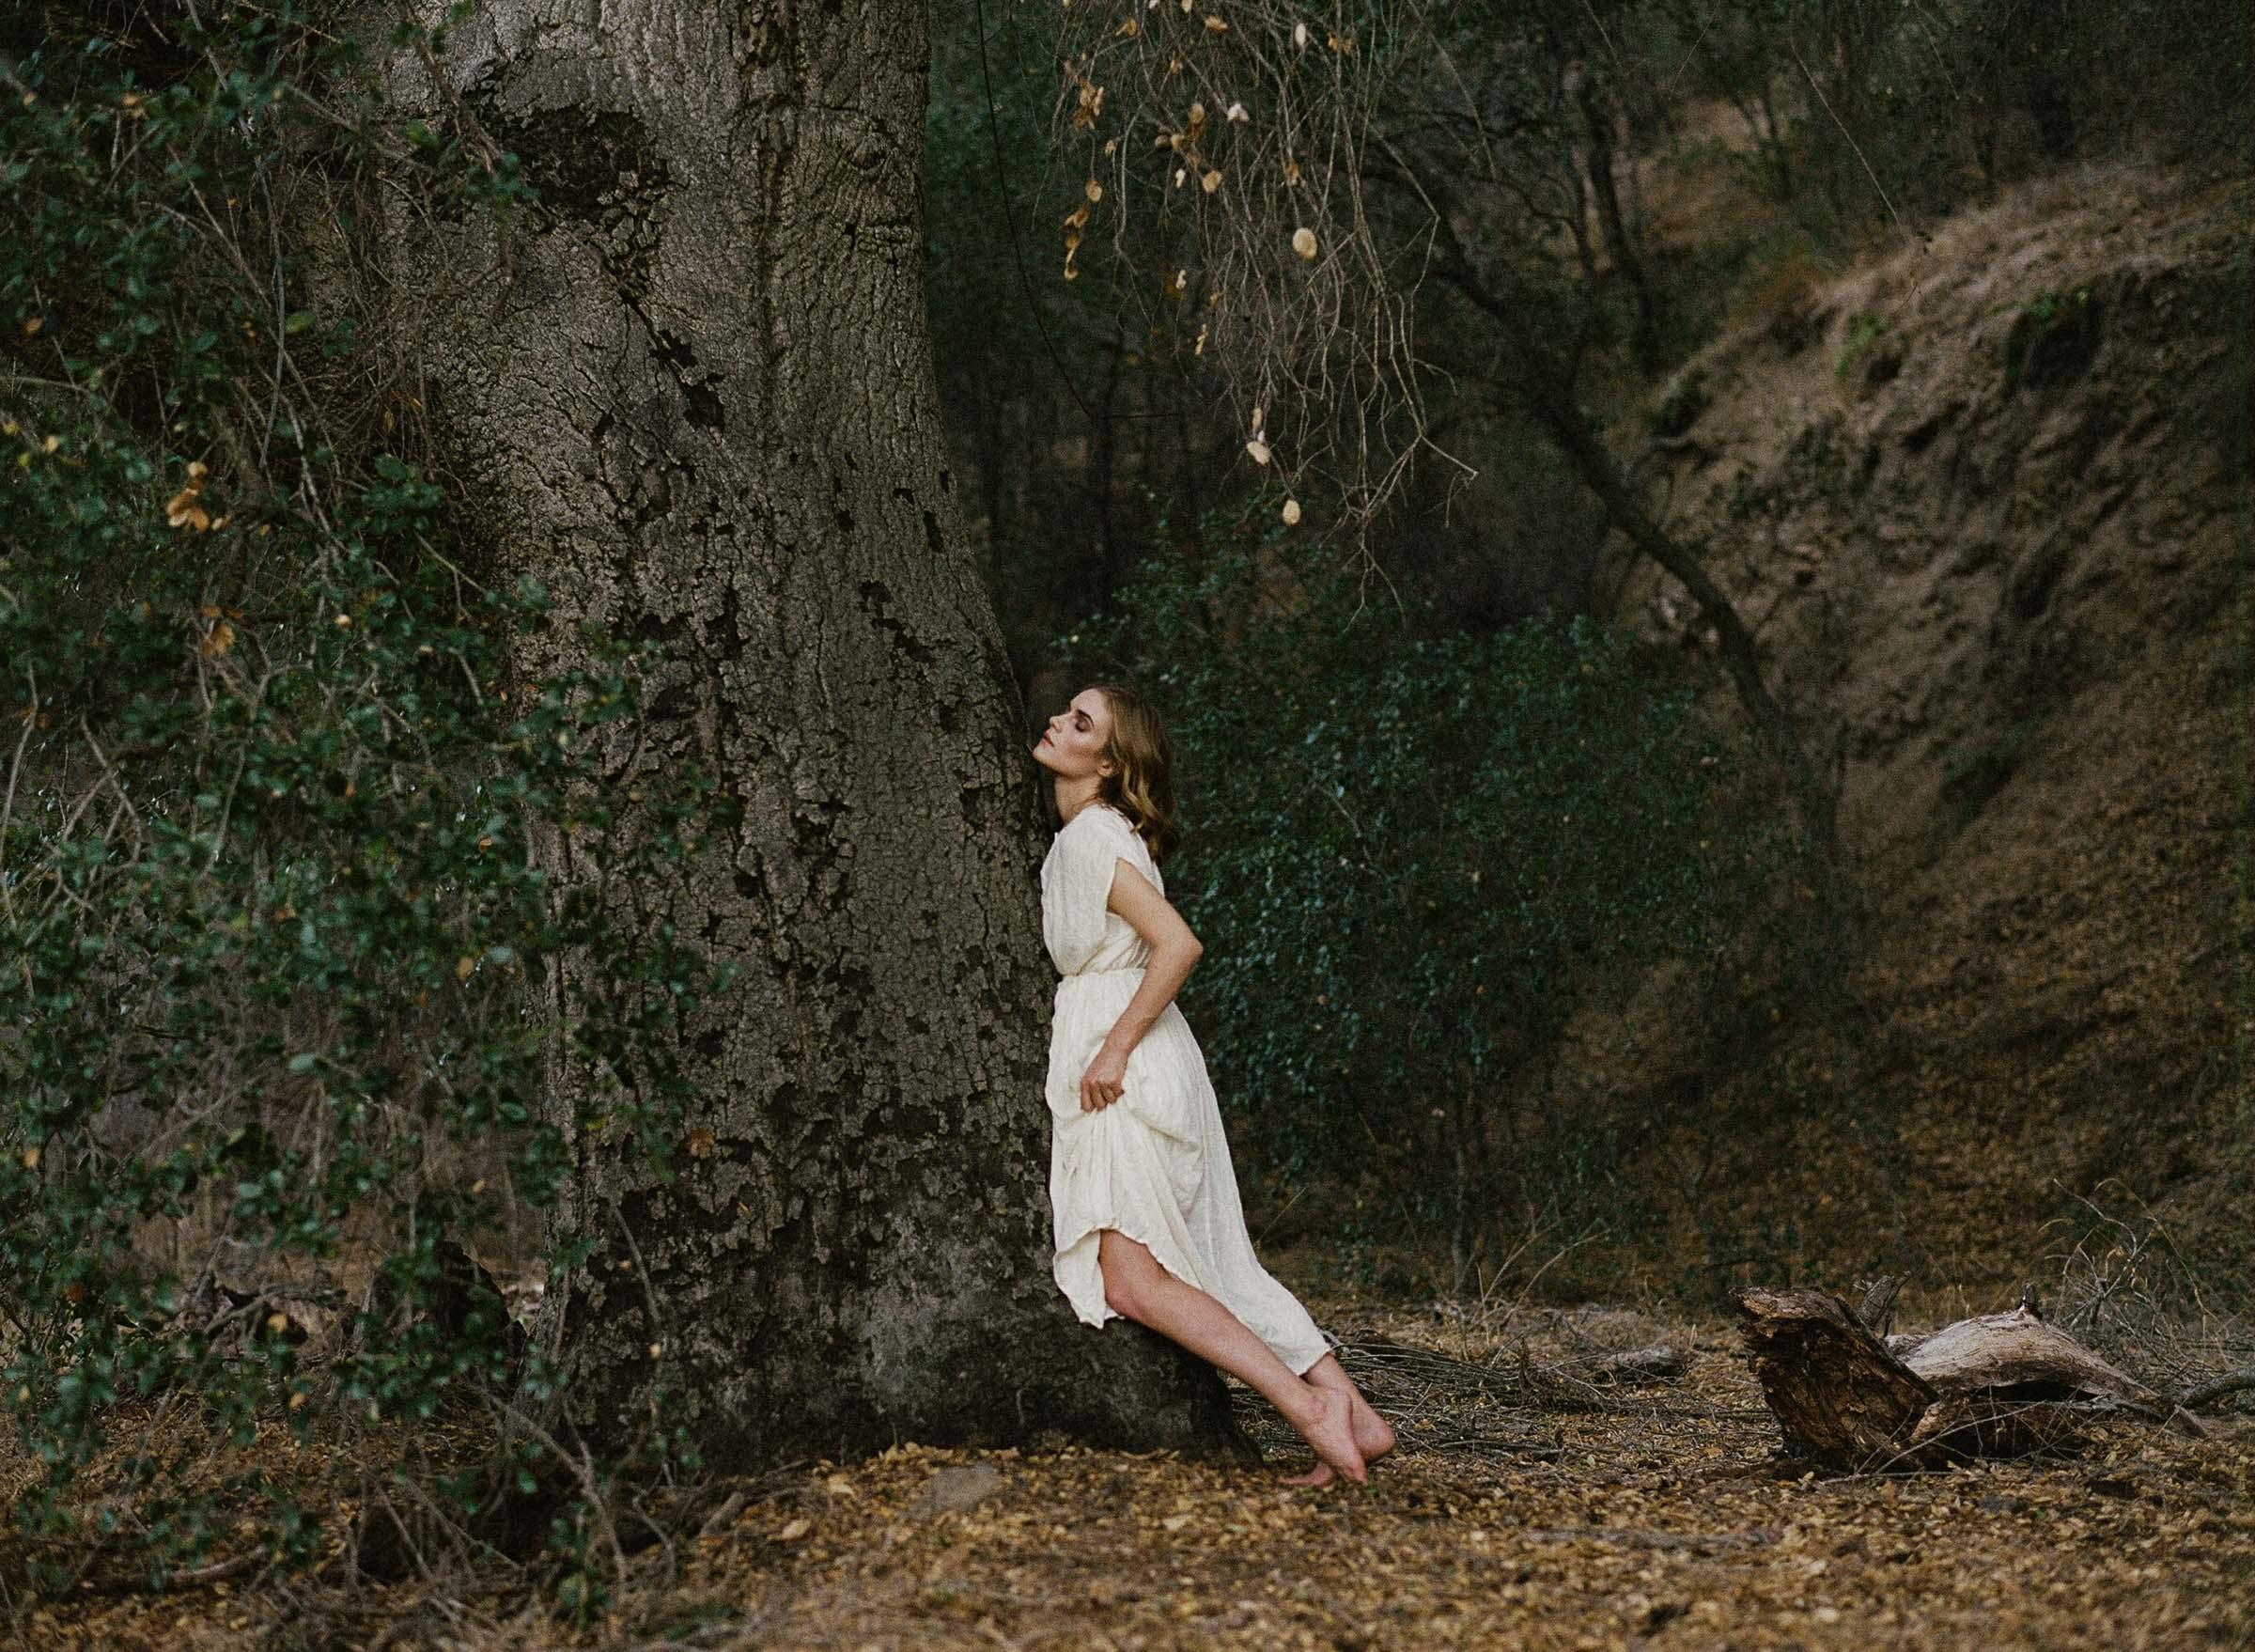 meredith-tree-003.jpg